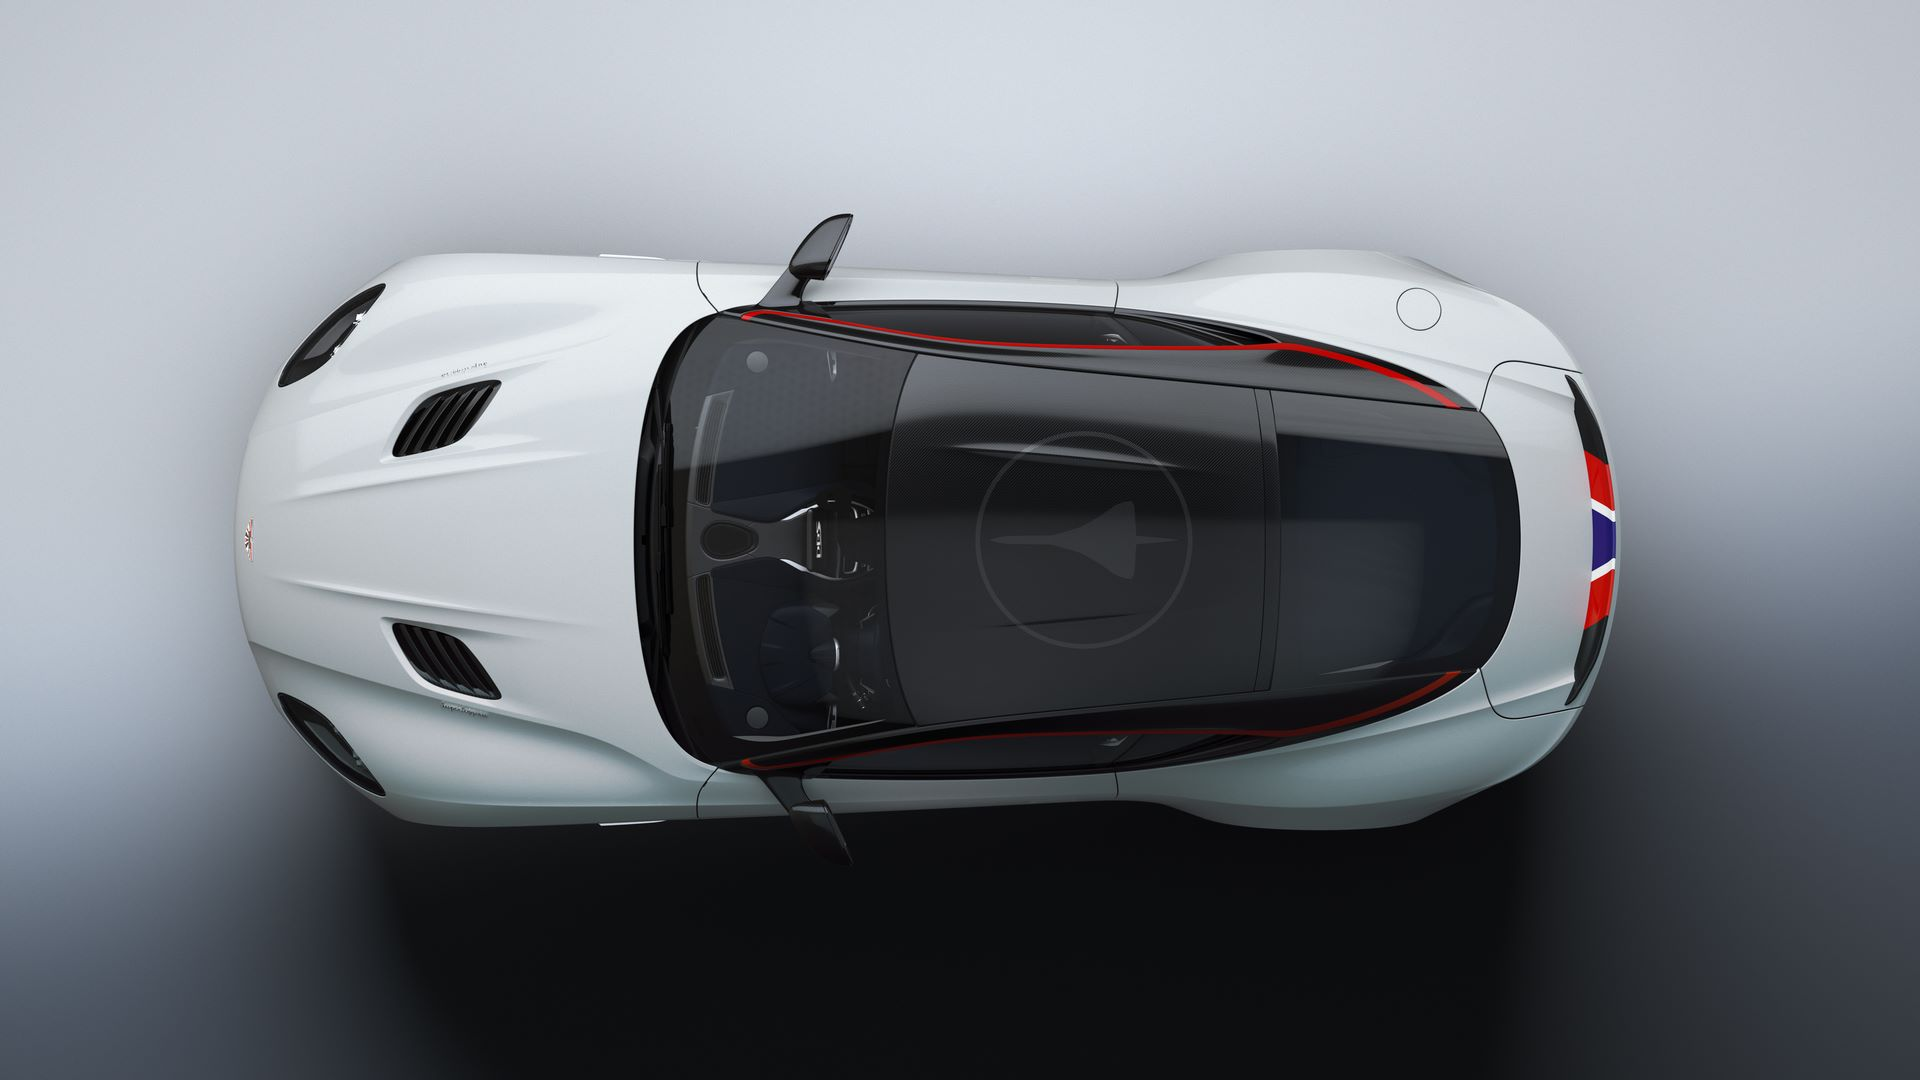 Aston-Martin-DBS-Superleggera-Concorde-Edition_15